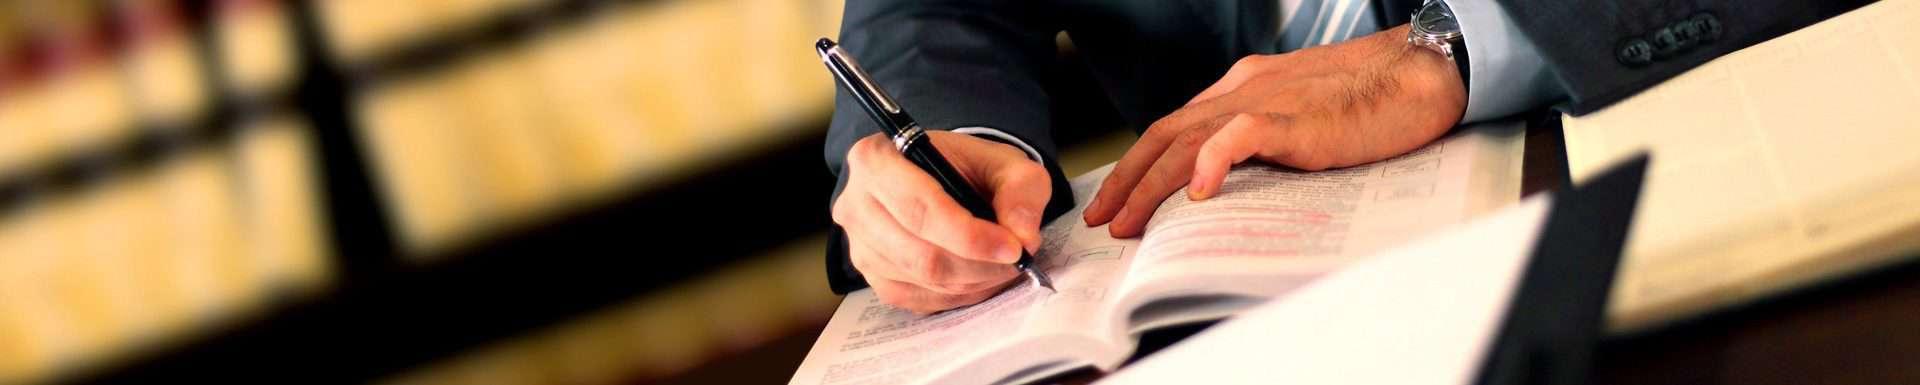 חוק, משפט ועריכת דין